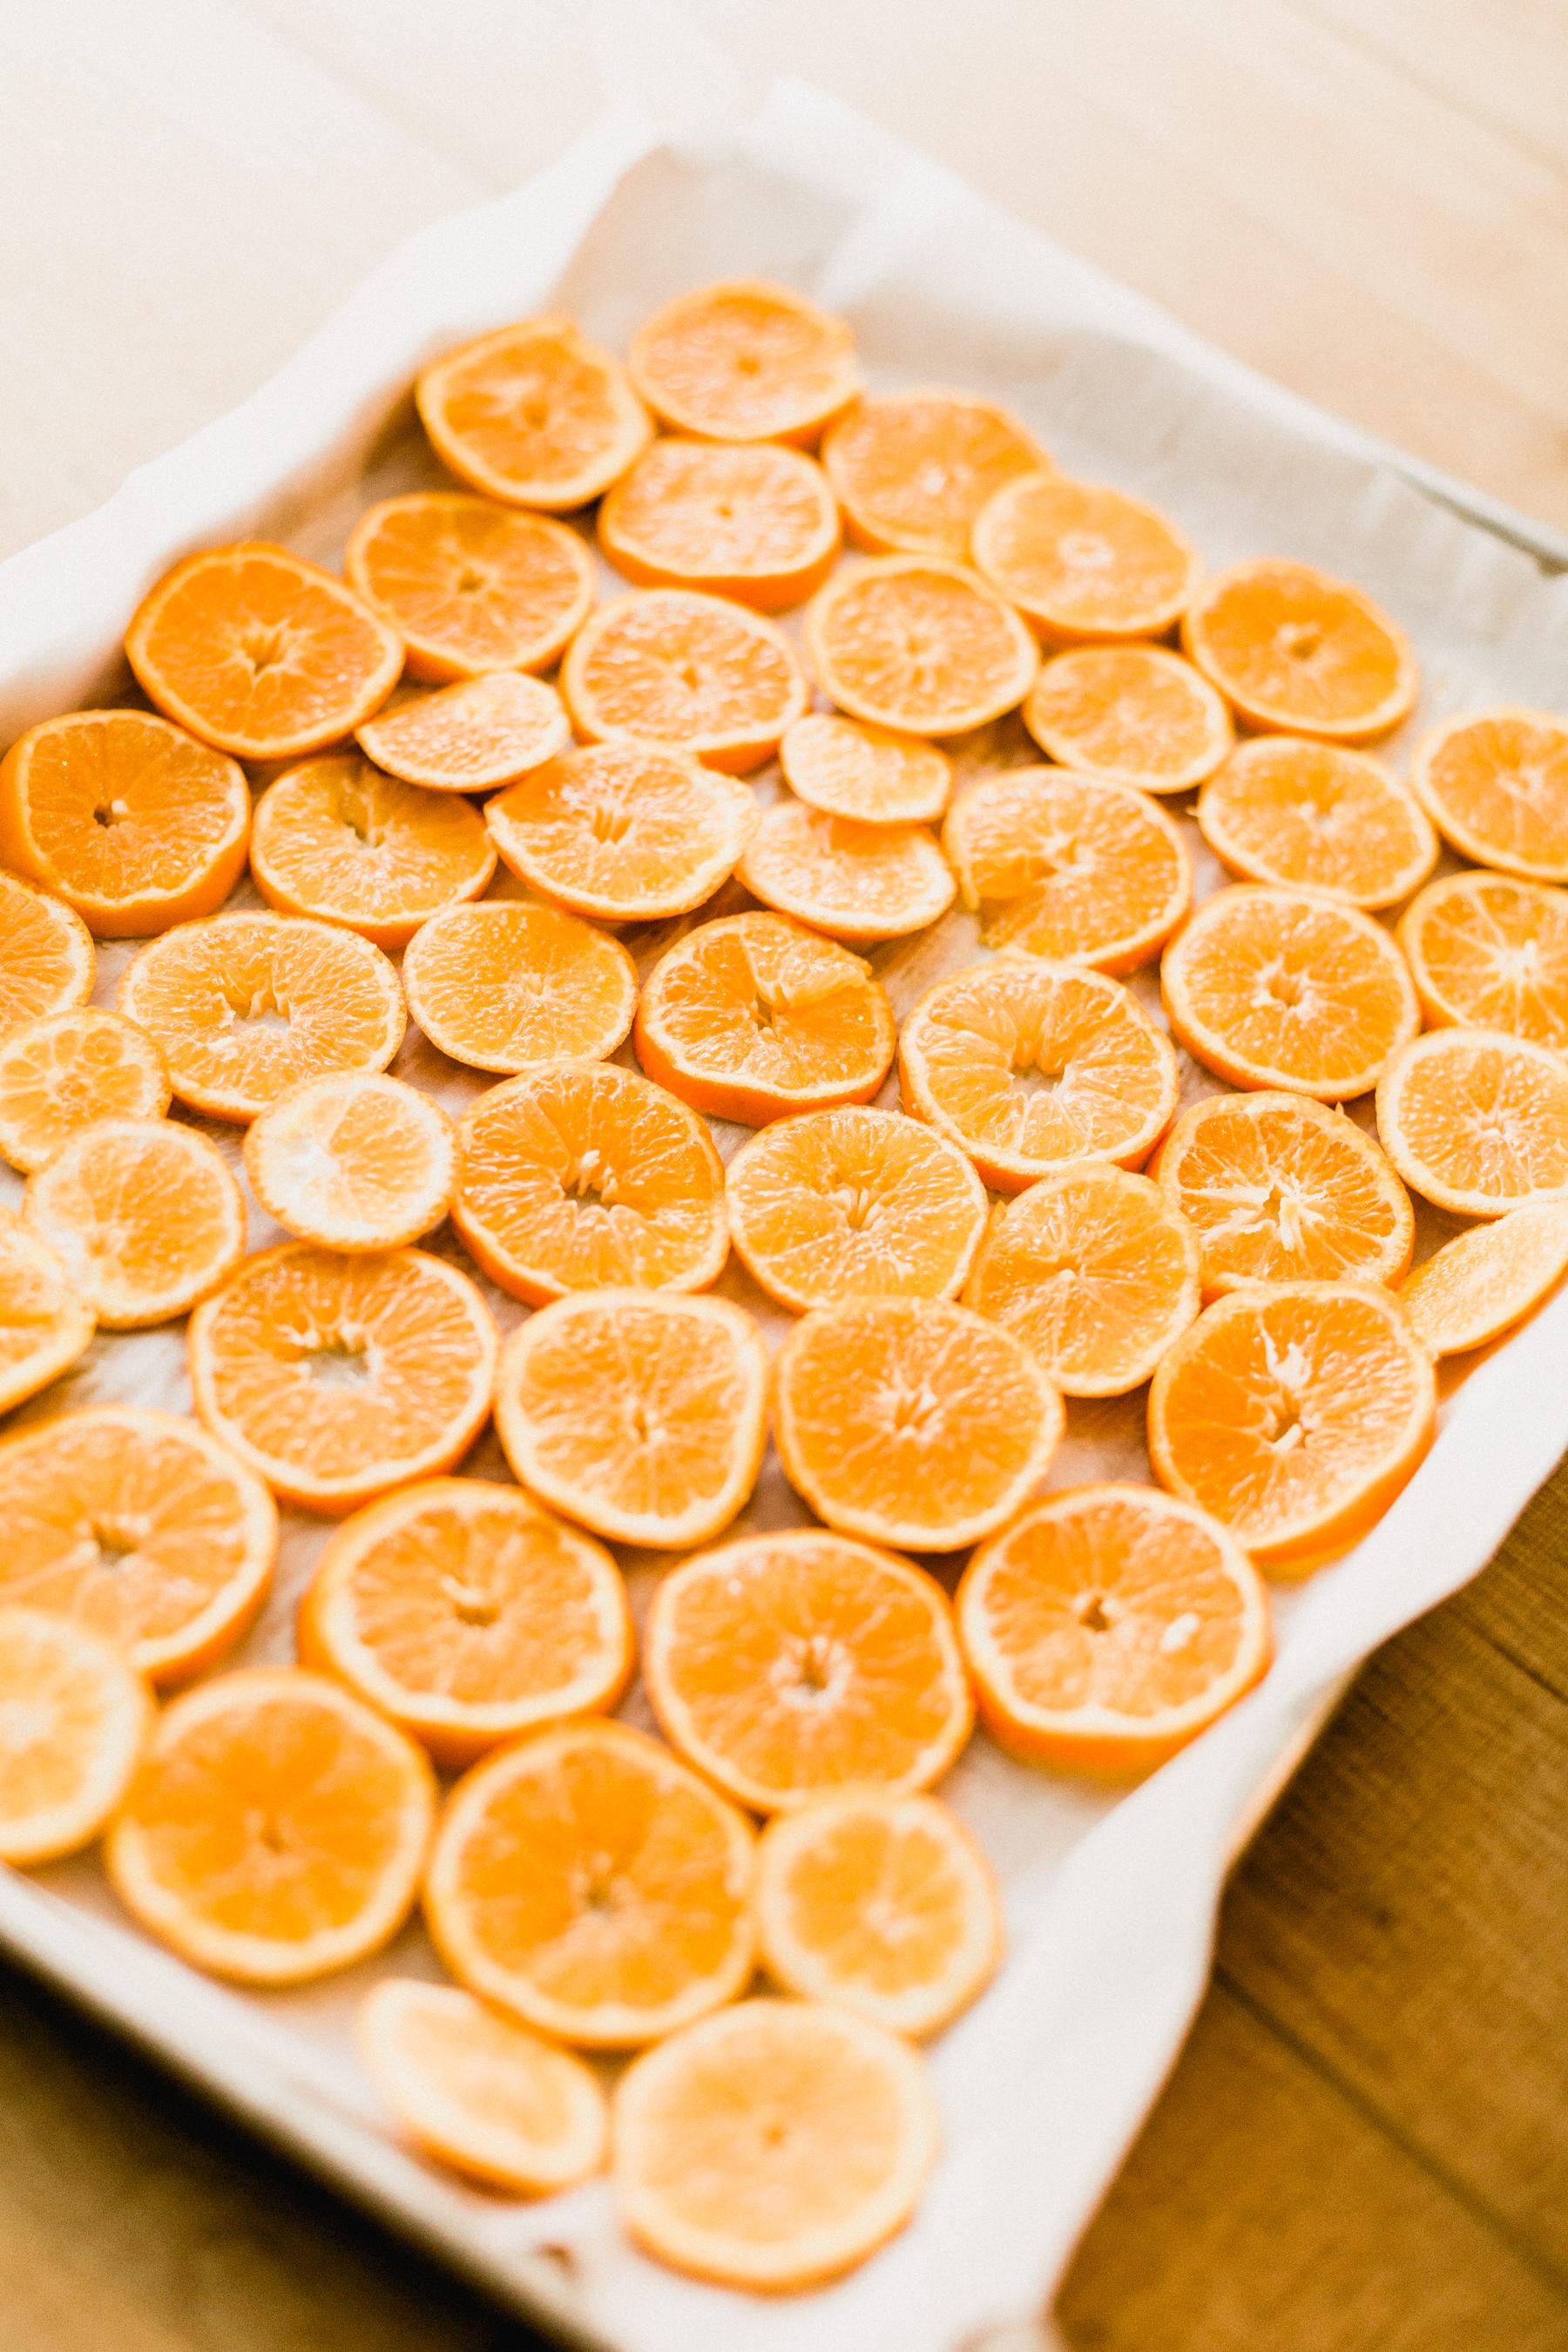 Oranges-9.jpg